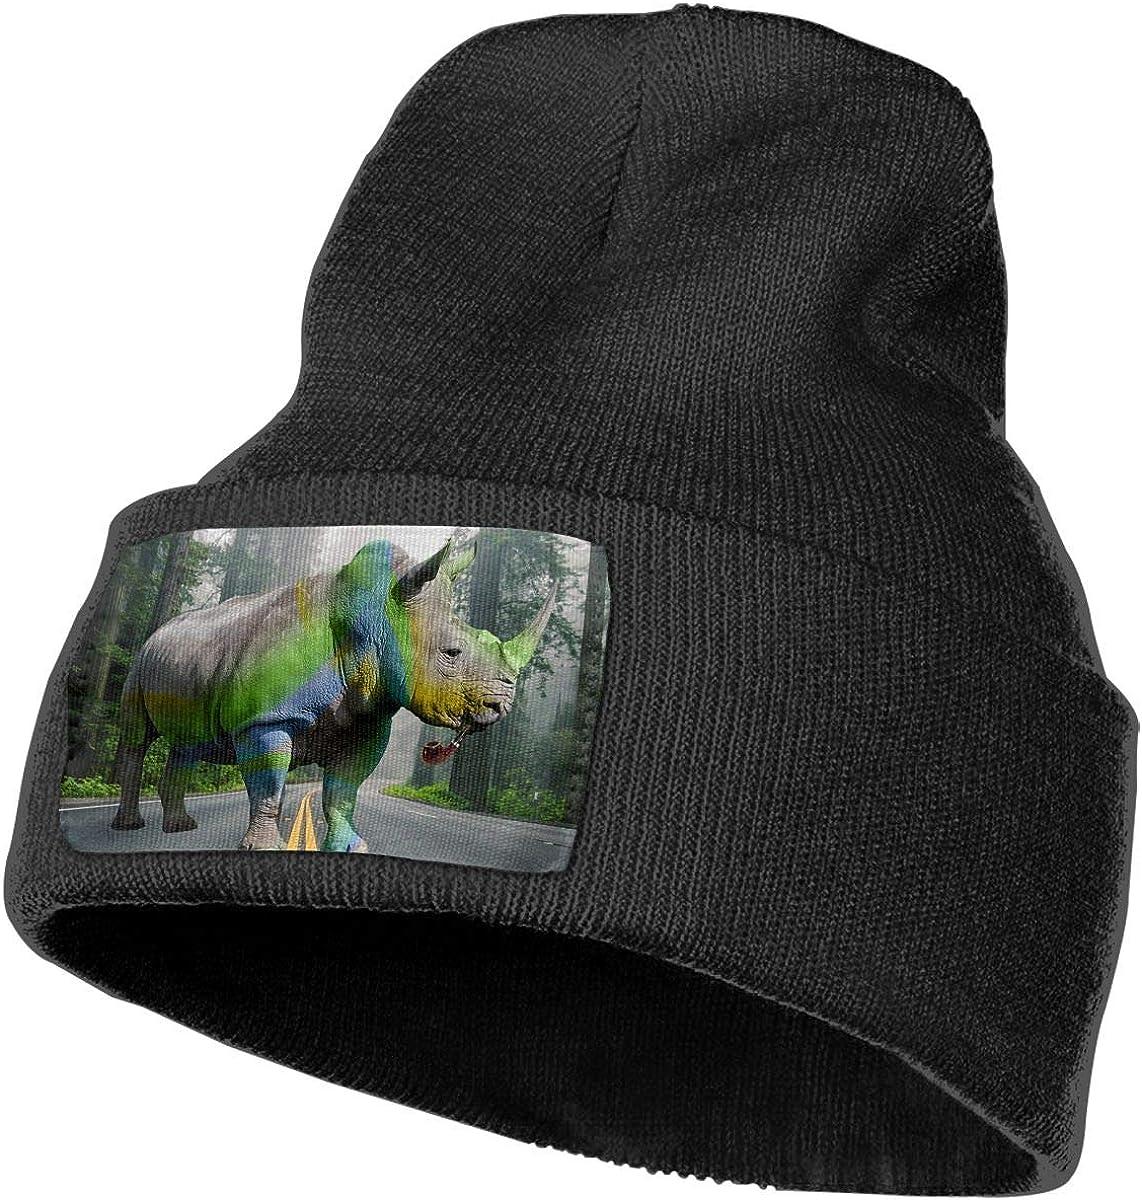 Rhino Pipe Smoking Men/&Women Warm Winter Knit Plain Beanie Hat Skull Cap Acrylic Knit Cuff Hat